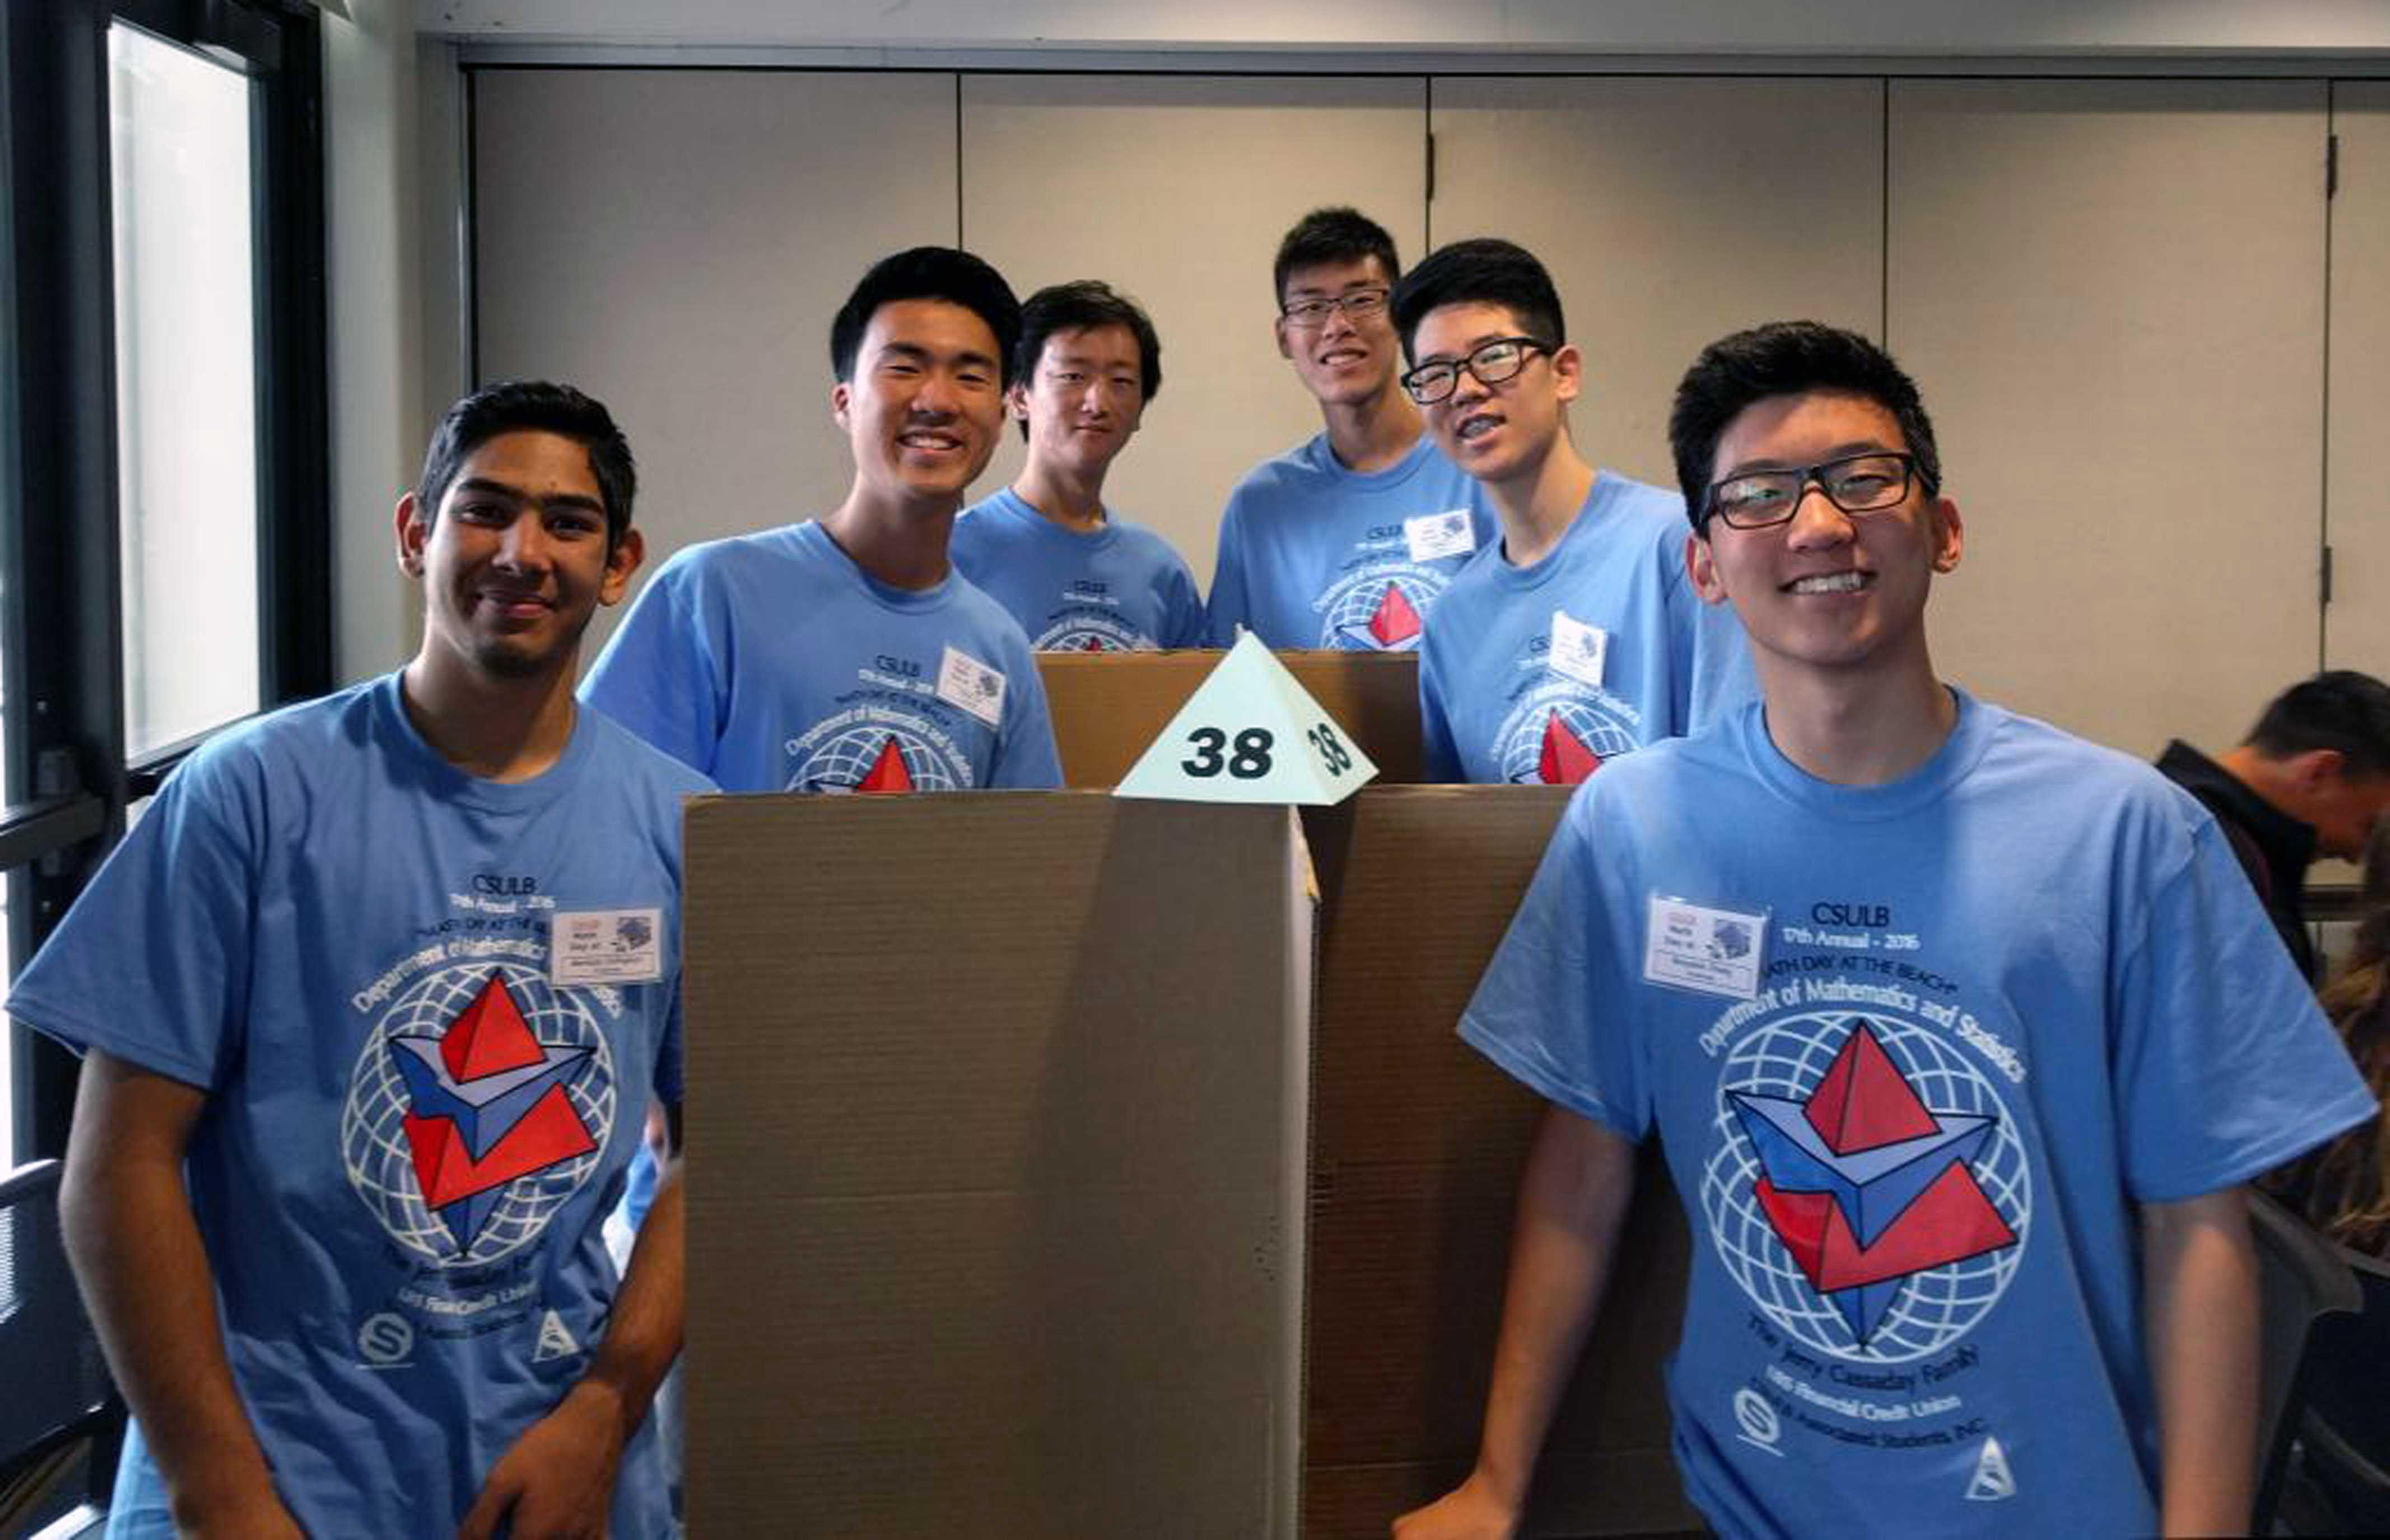 Junior Morteza  Zolfaghari, Seniors Daniel Sun, Andrew Lee, Yucheng Liu, junior Matthew Kim, and Freshman Benjamin Chang, bravely face the individual assessments.